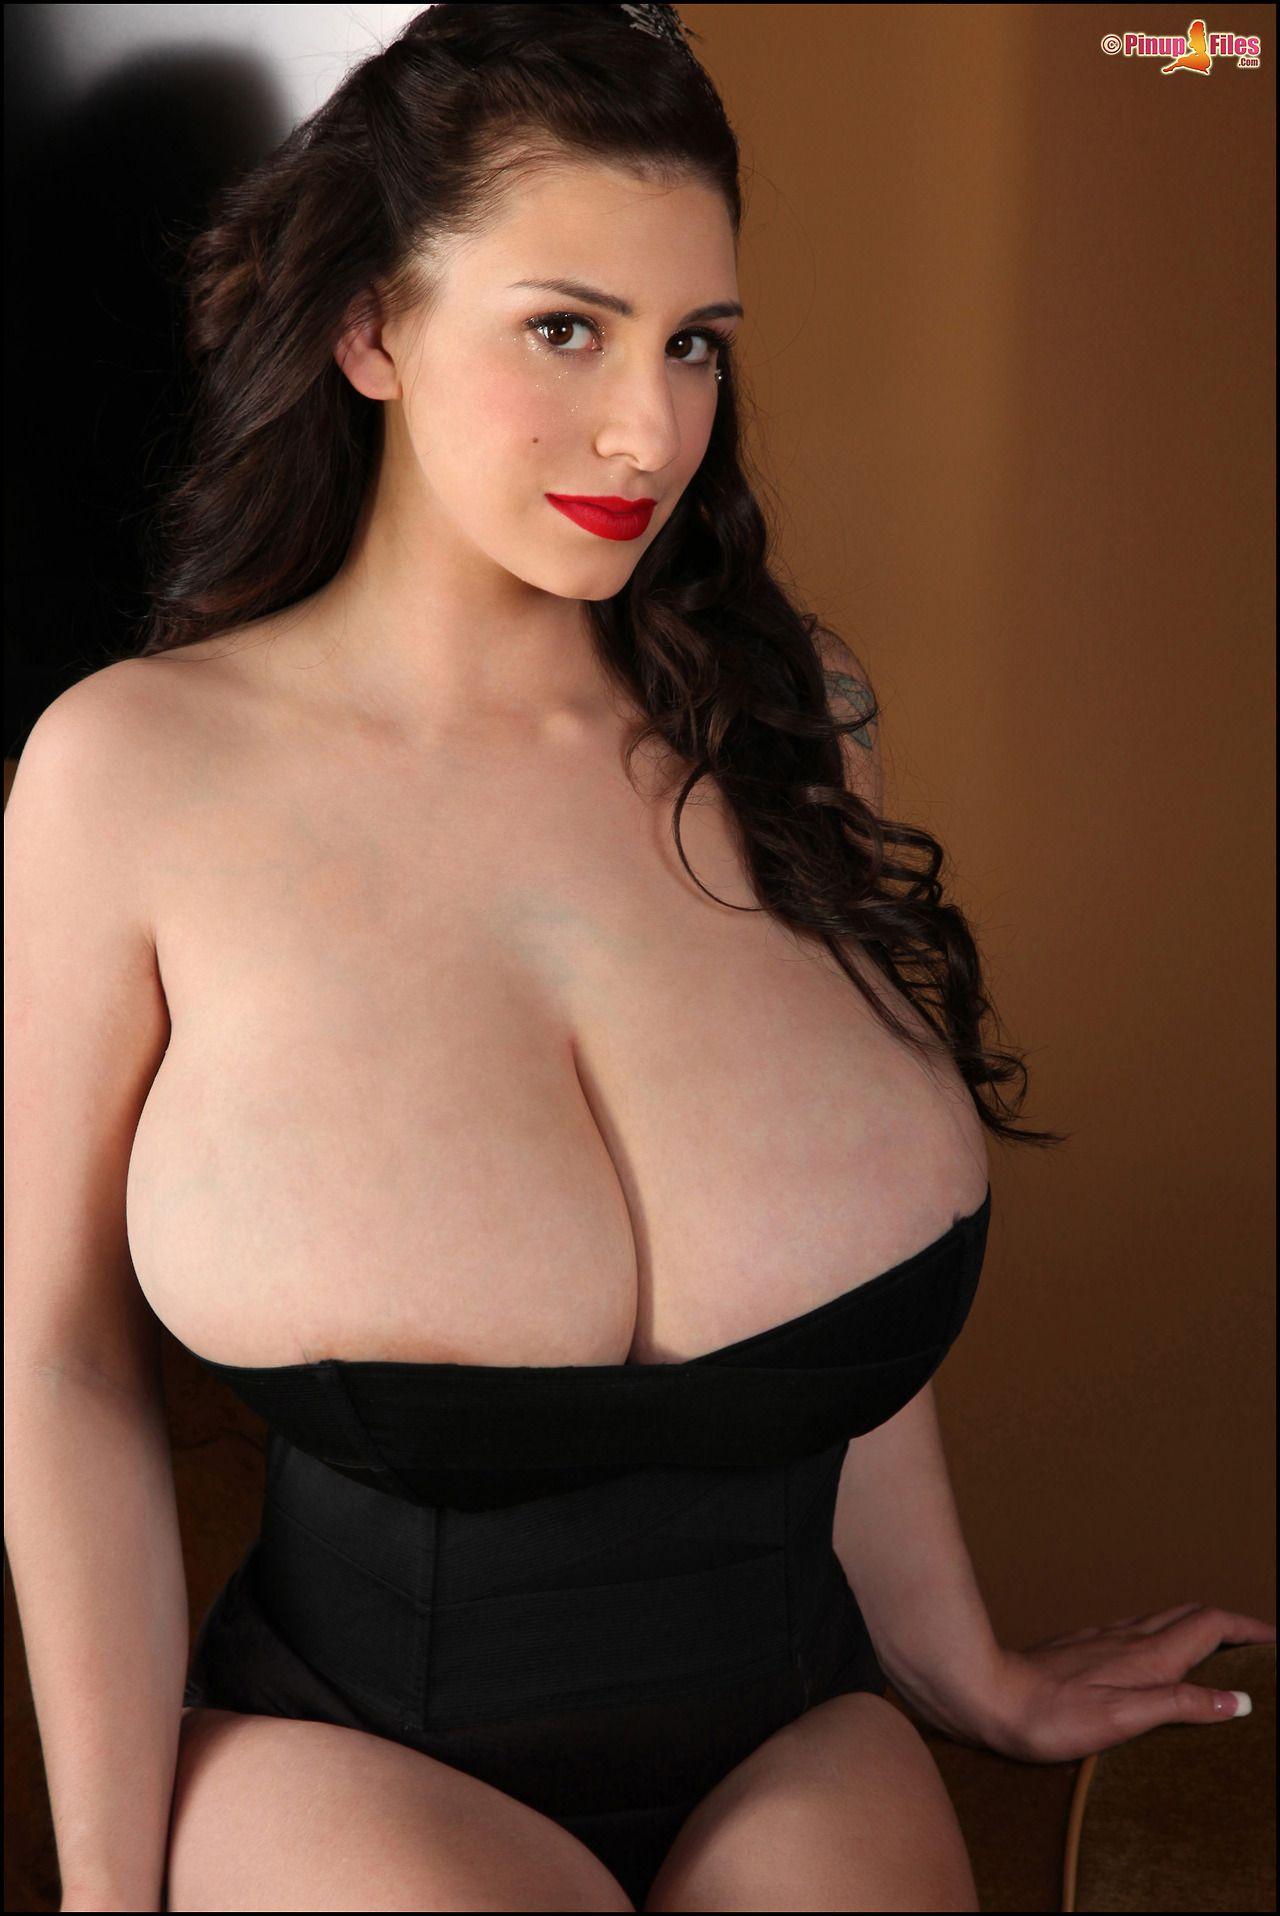 Big nude boobs suck